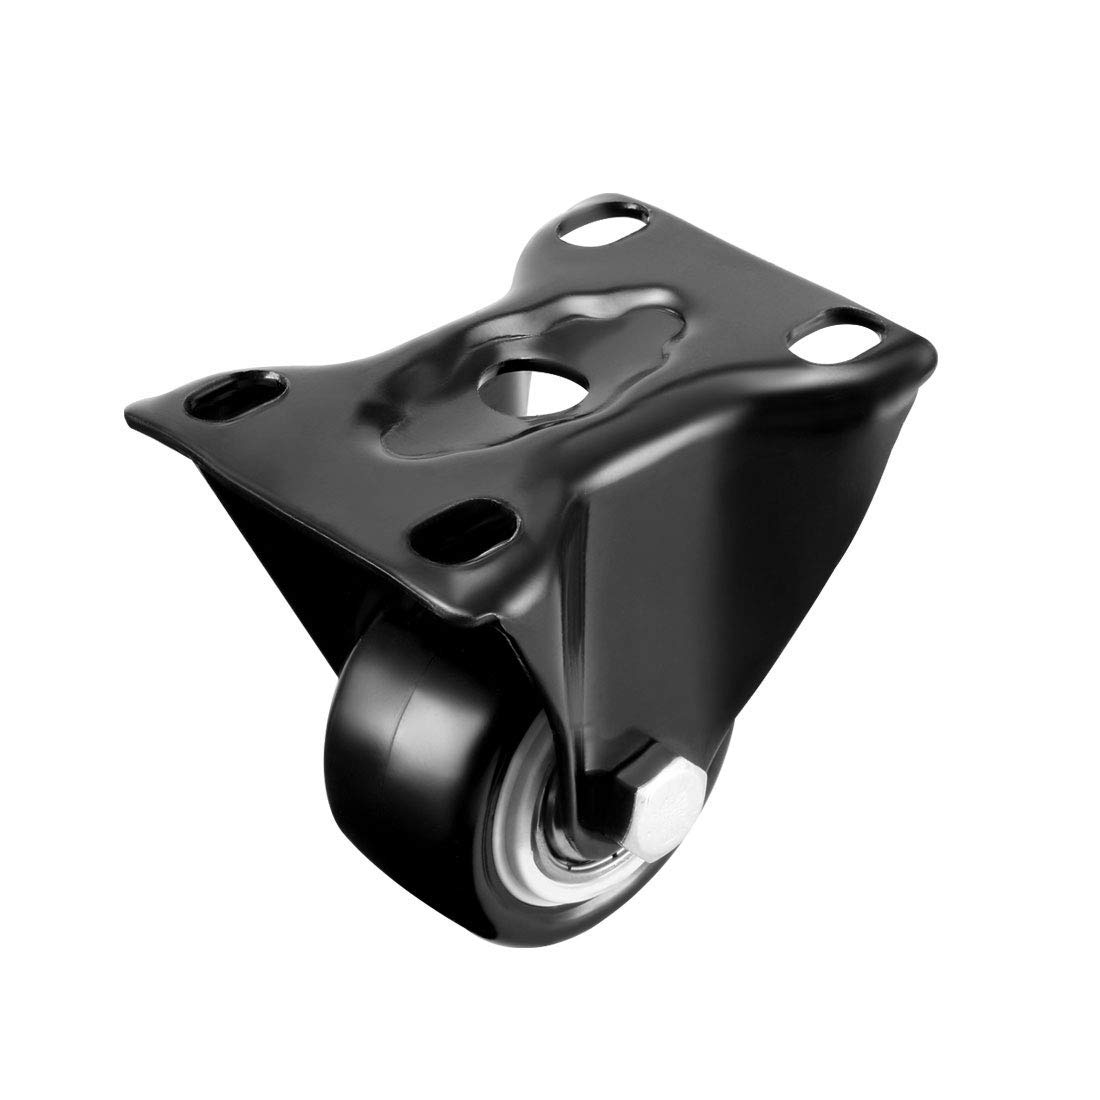 Caster line Caster deals 4 4 Cheap on Wheels find Inch Inch Wheels 06xnUPTq